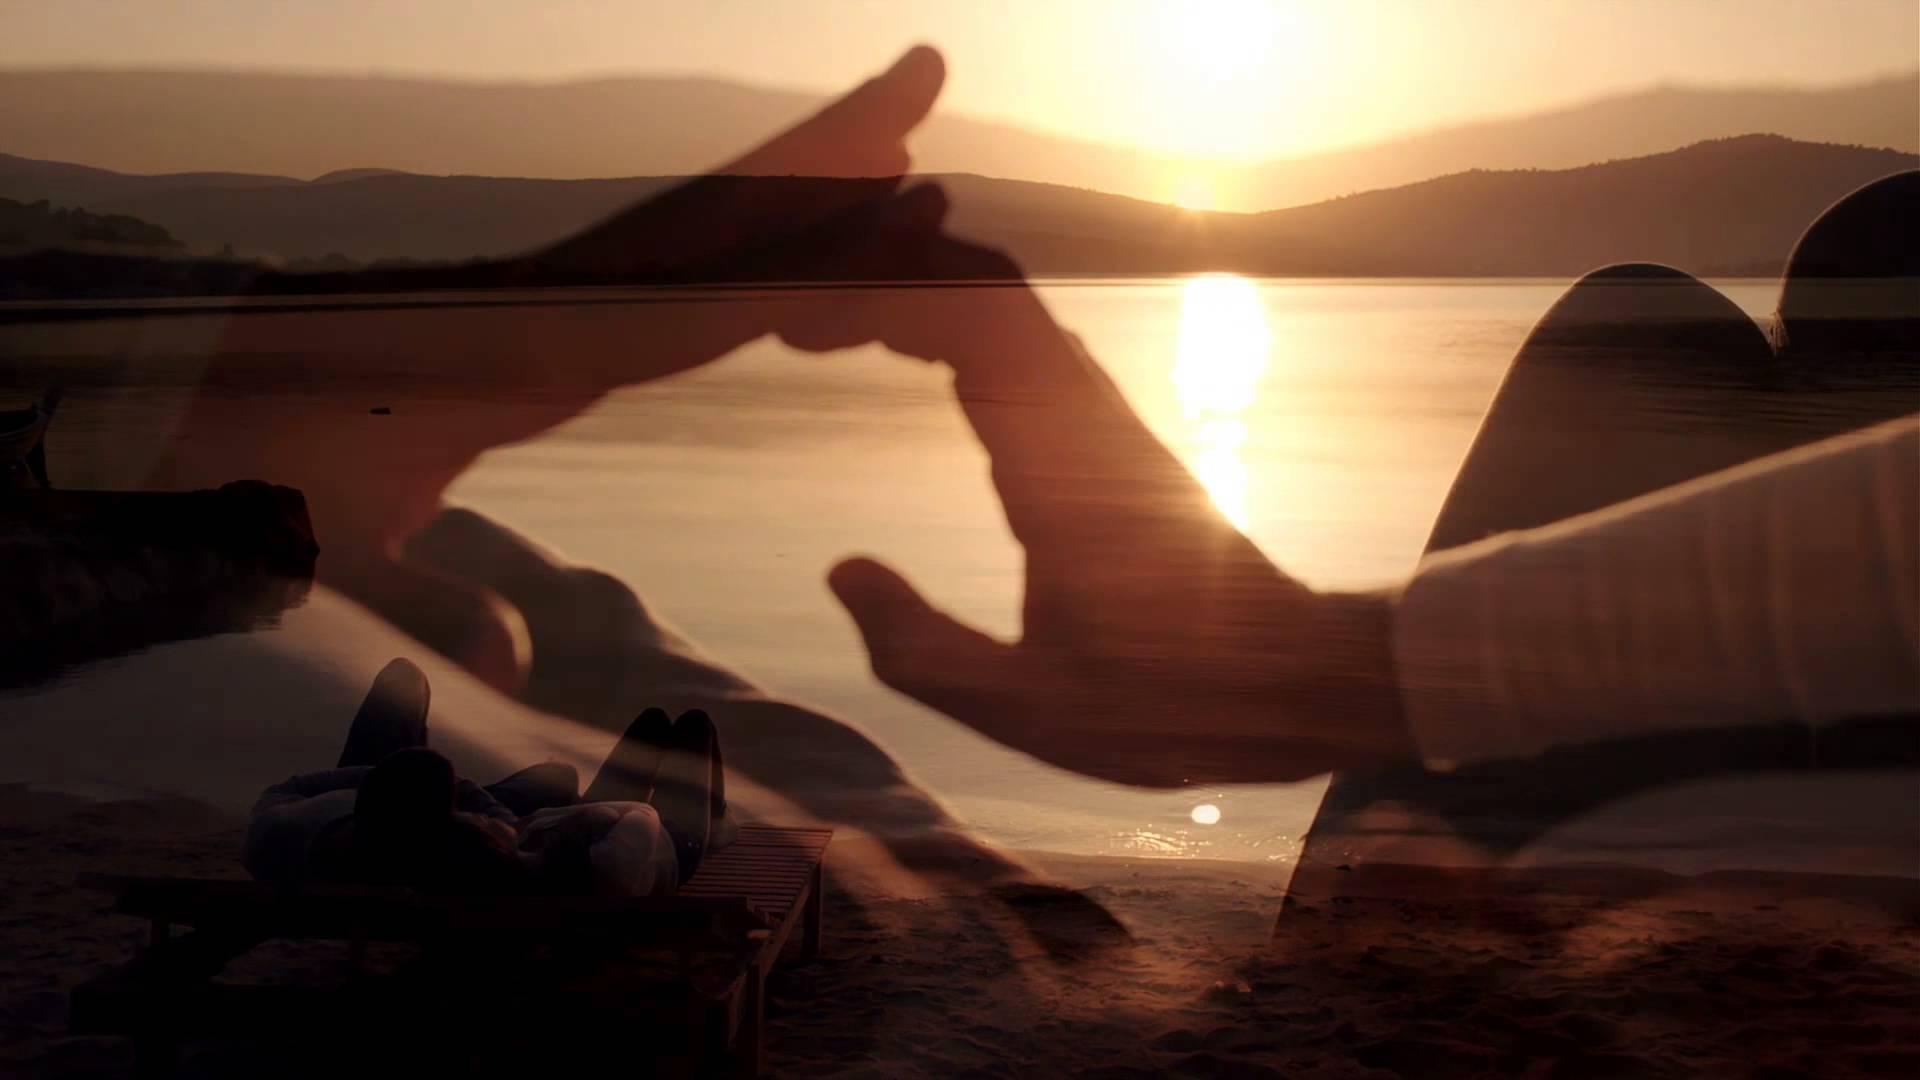 Открытки о любви на турецком